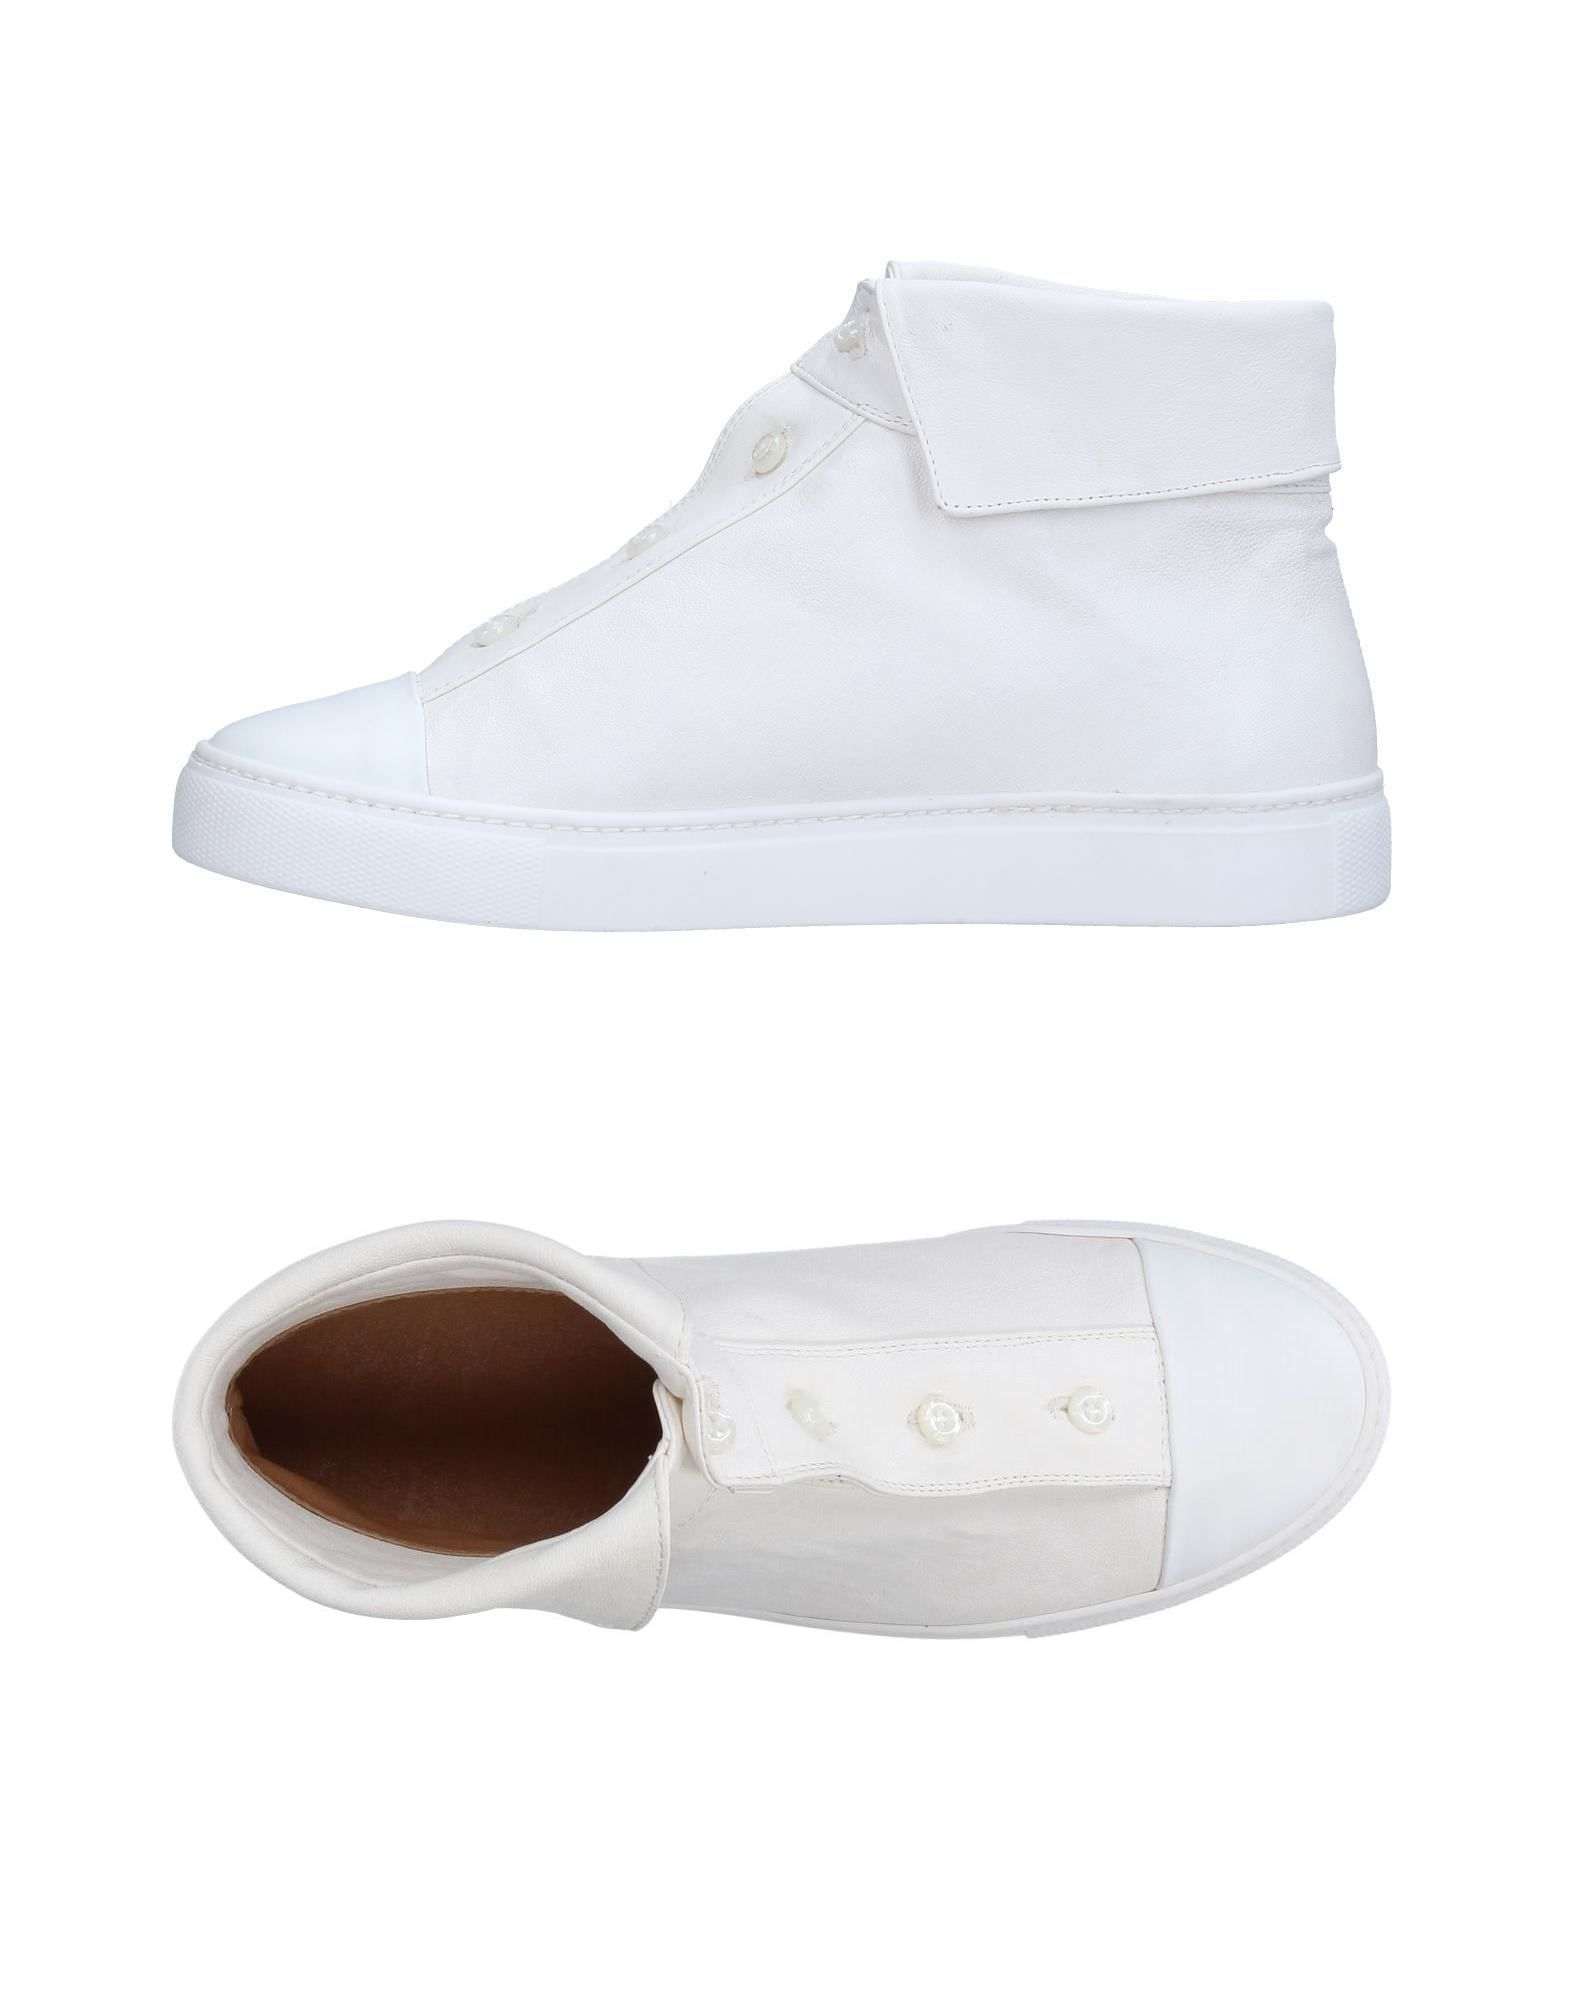 Sneakers Sciuscert Donna - Acquista online su